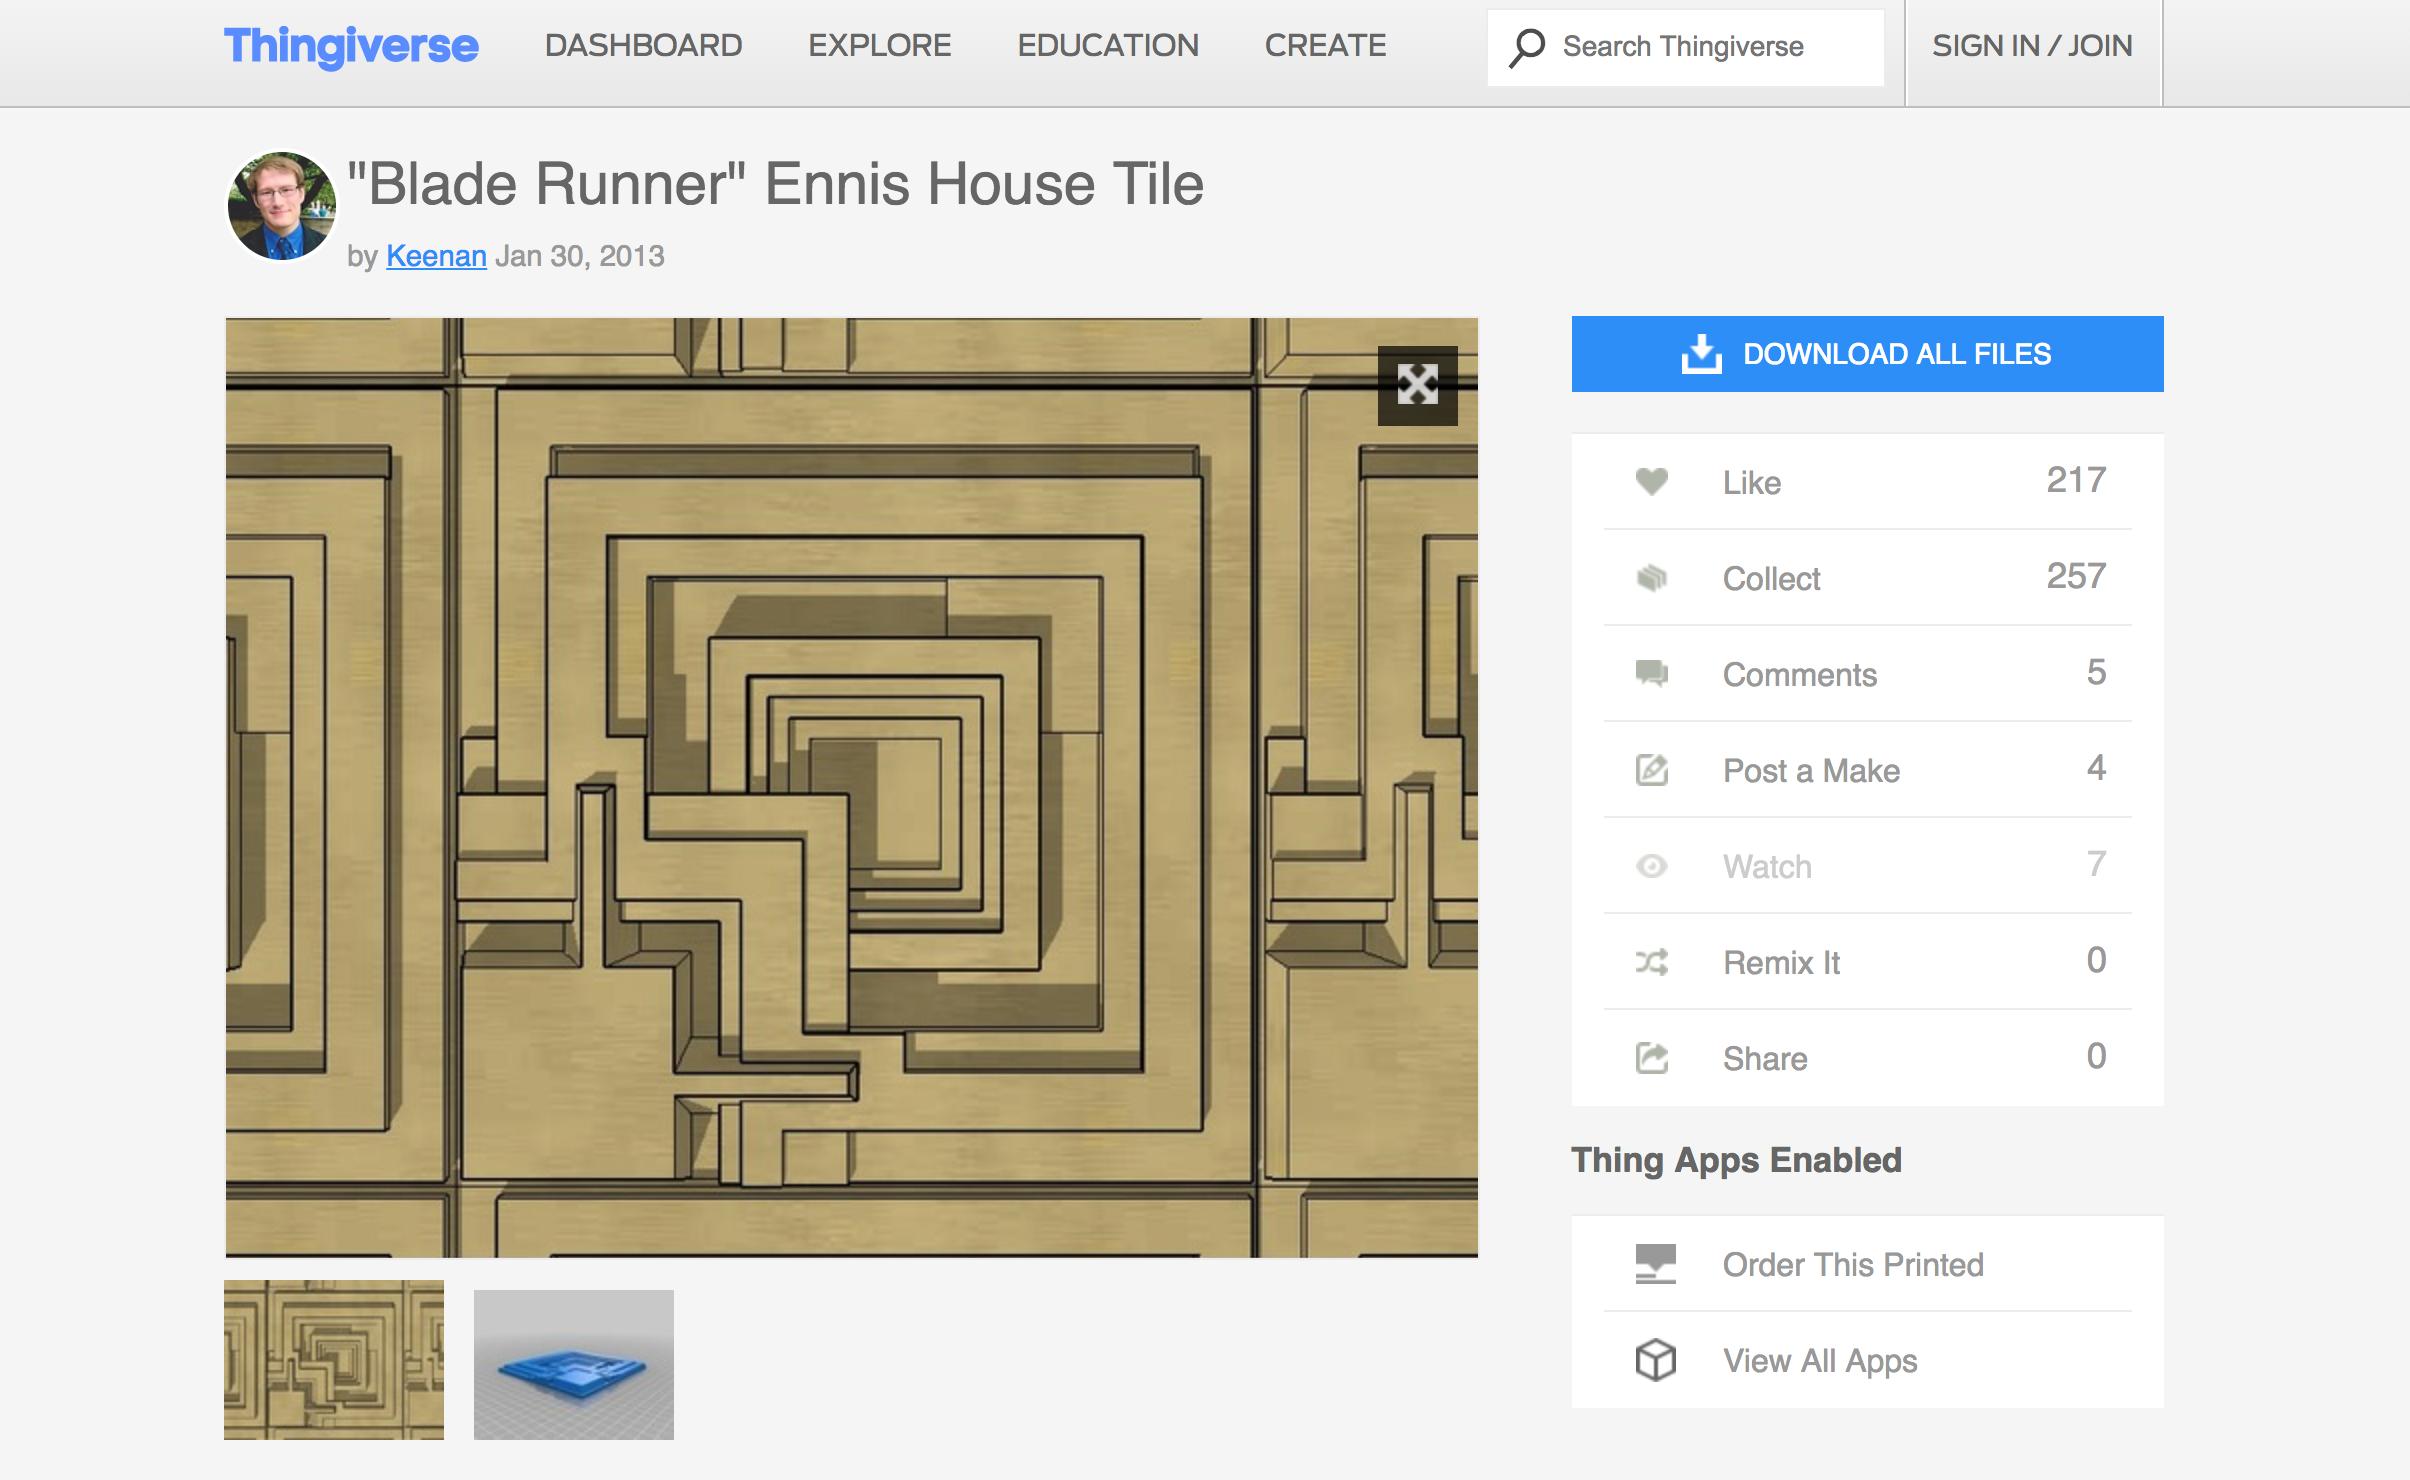 Keenan's Blade Runner Ennis House Tile page on Thingiverse